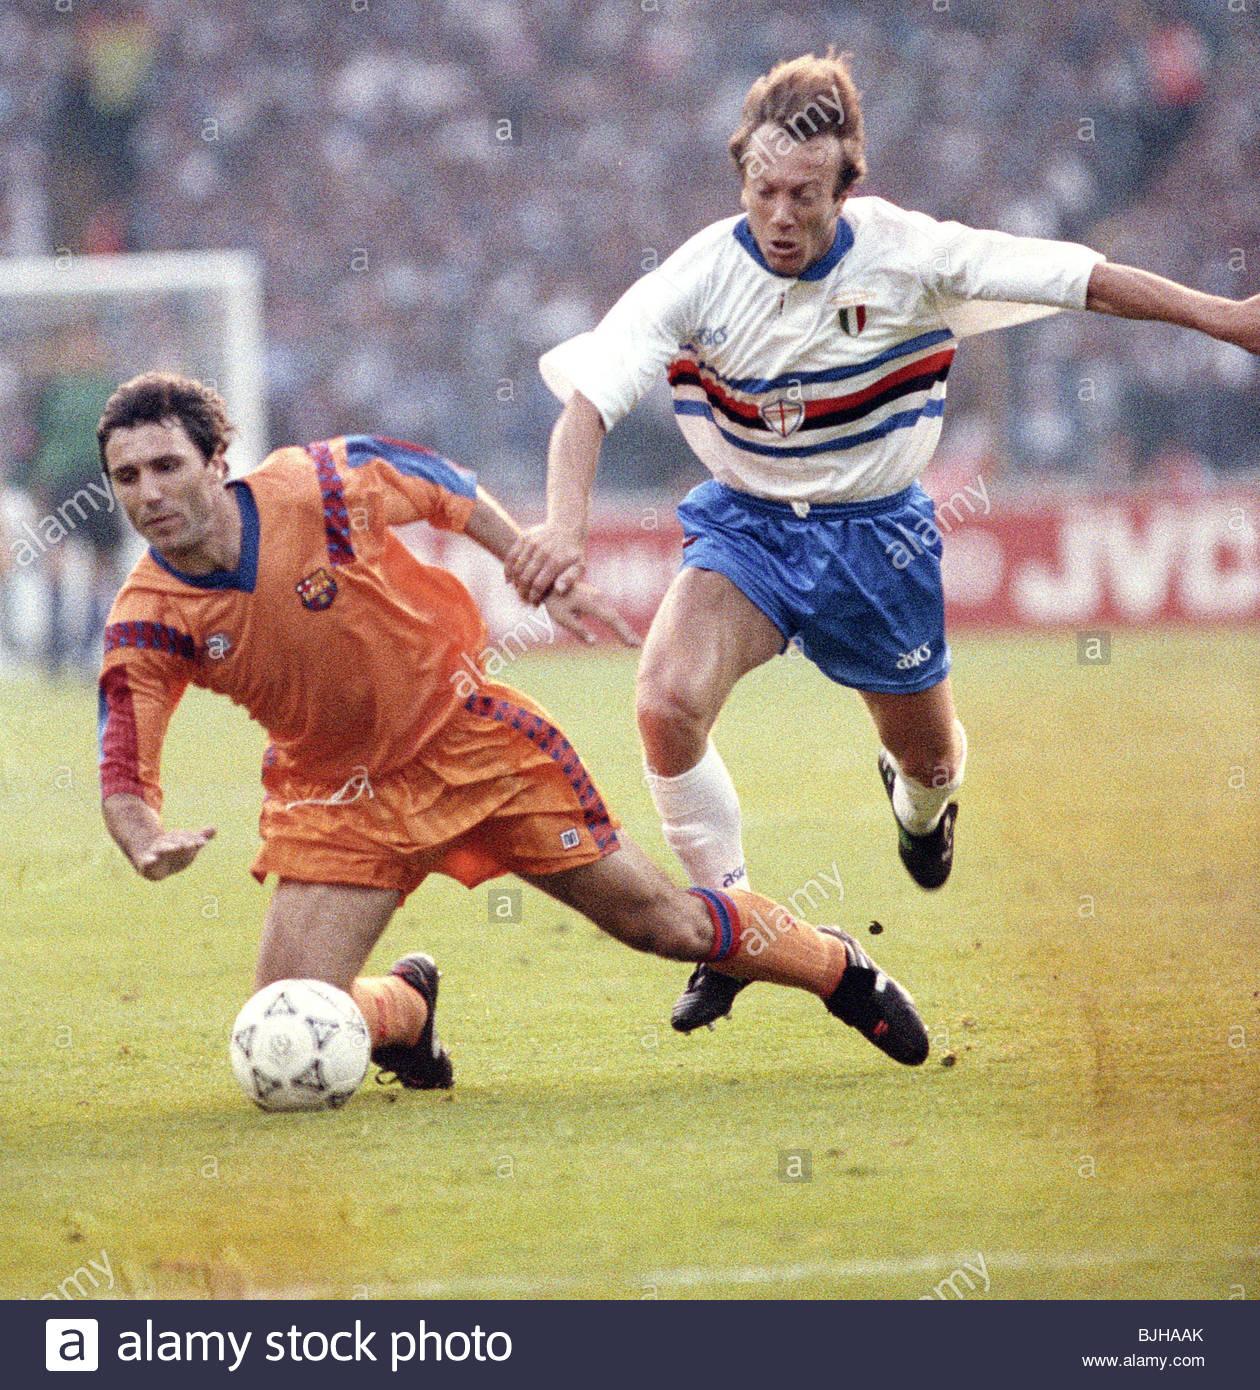 20/05/92 EUROPEAN CUP FINAL BARCELONA V SAMPDORIA (1-0) WEMBLEY - LONDON Barcelona's Hristo Stoitchkov (left) - Stock Image